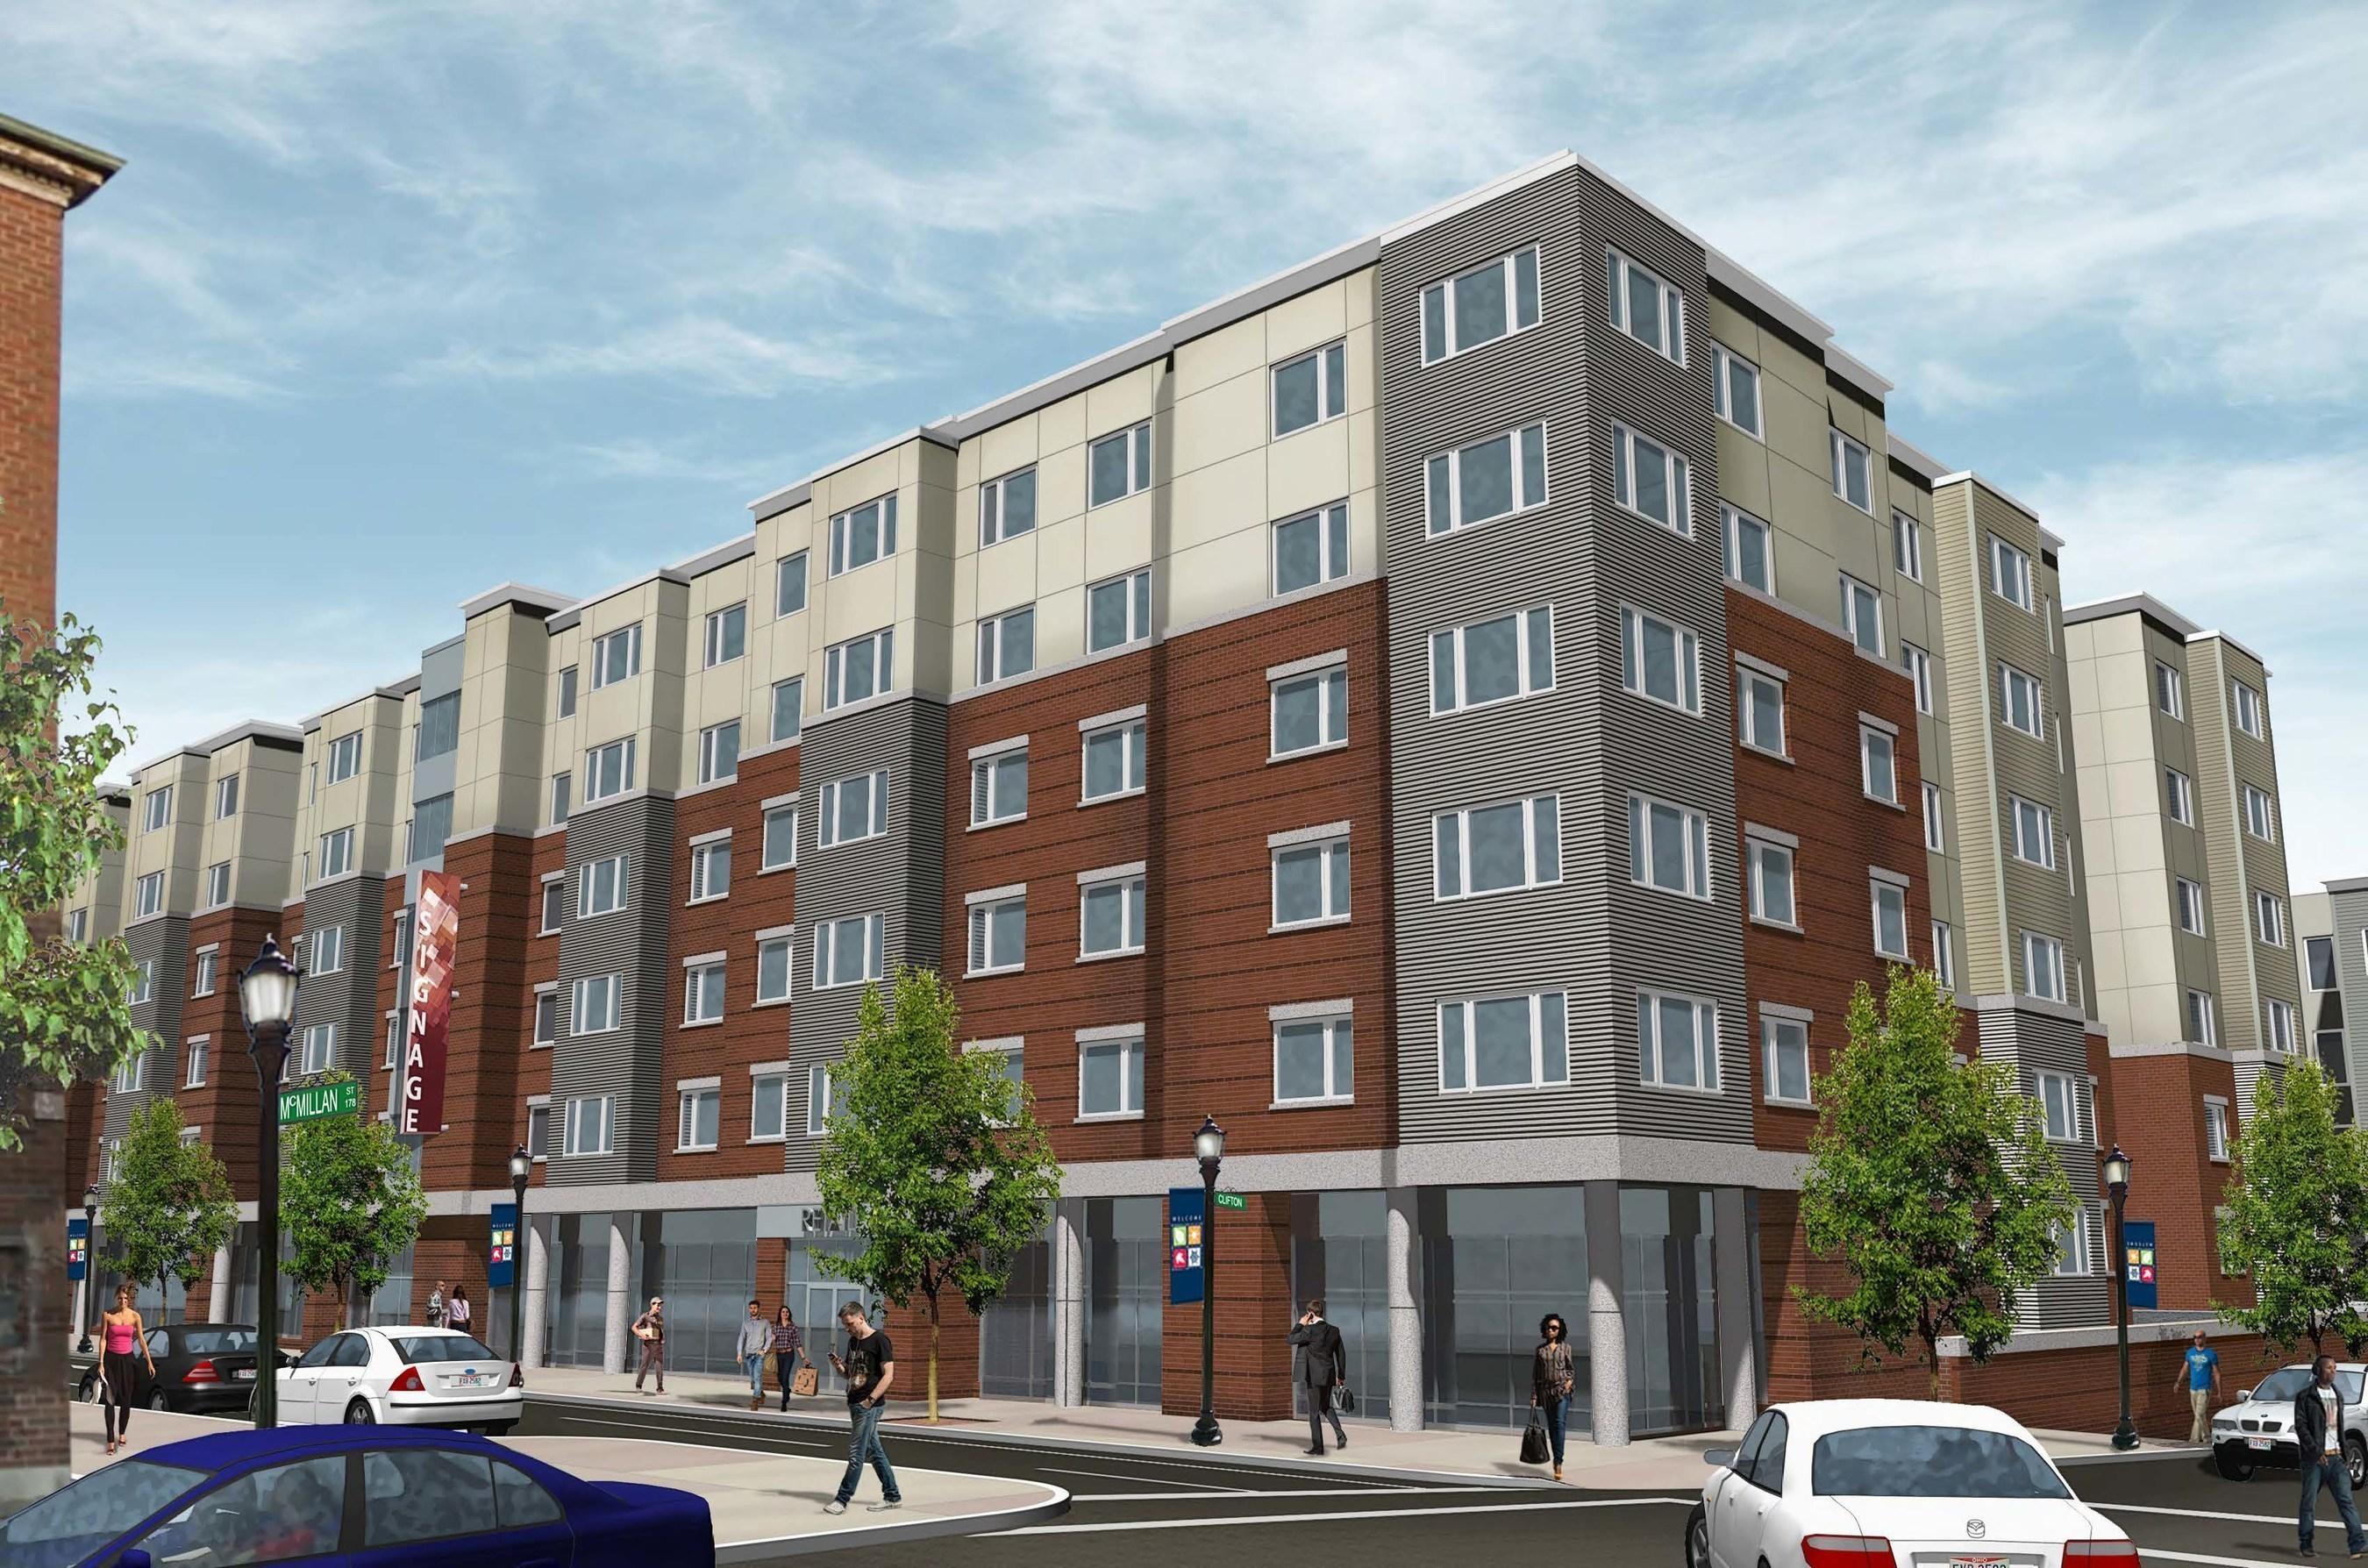 Gilbane Development Company breaks ground on brand new student housing for University of Cincinnati students